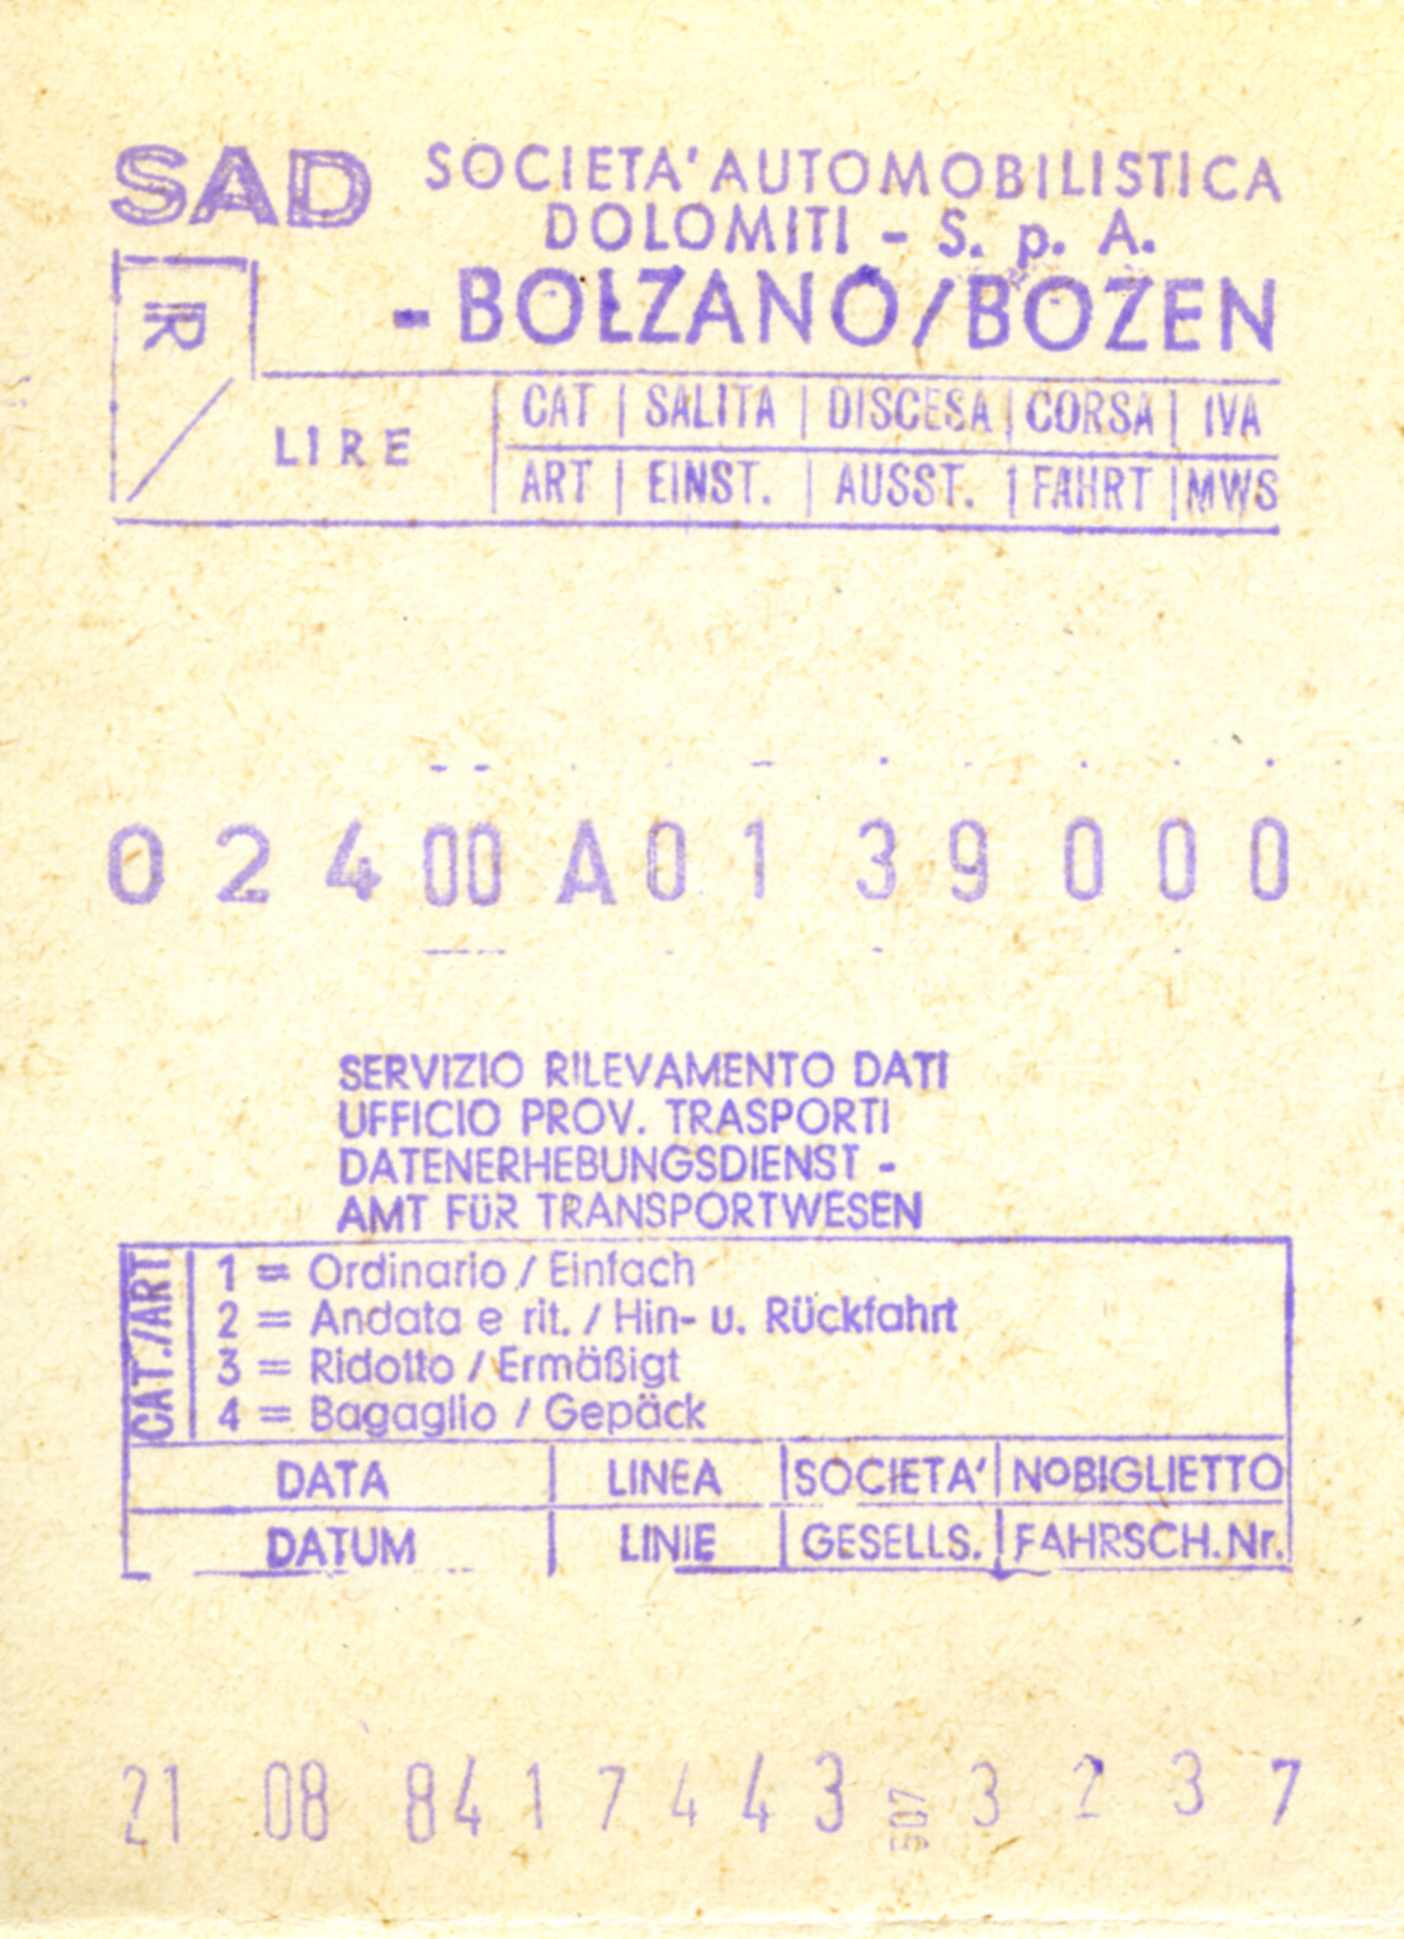 File:South Tyrol SAD bus ticket 3237.jpg - Wikimedia Commons